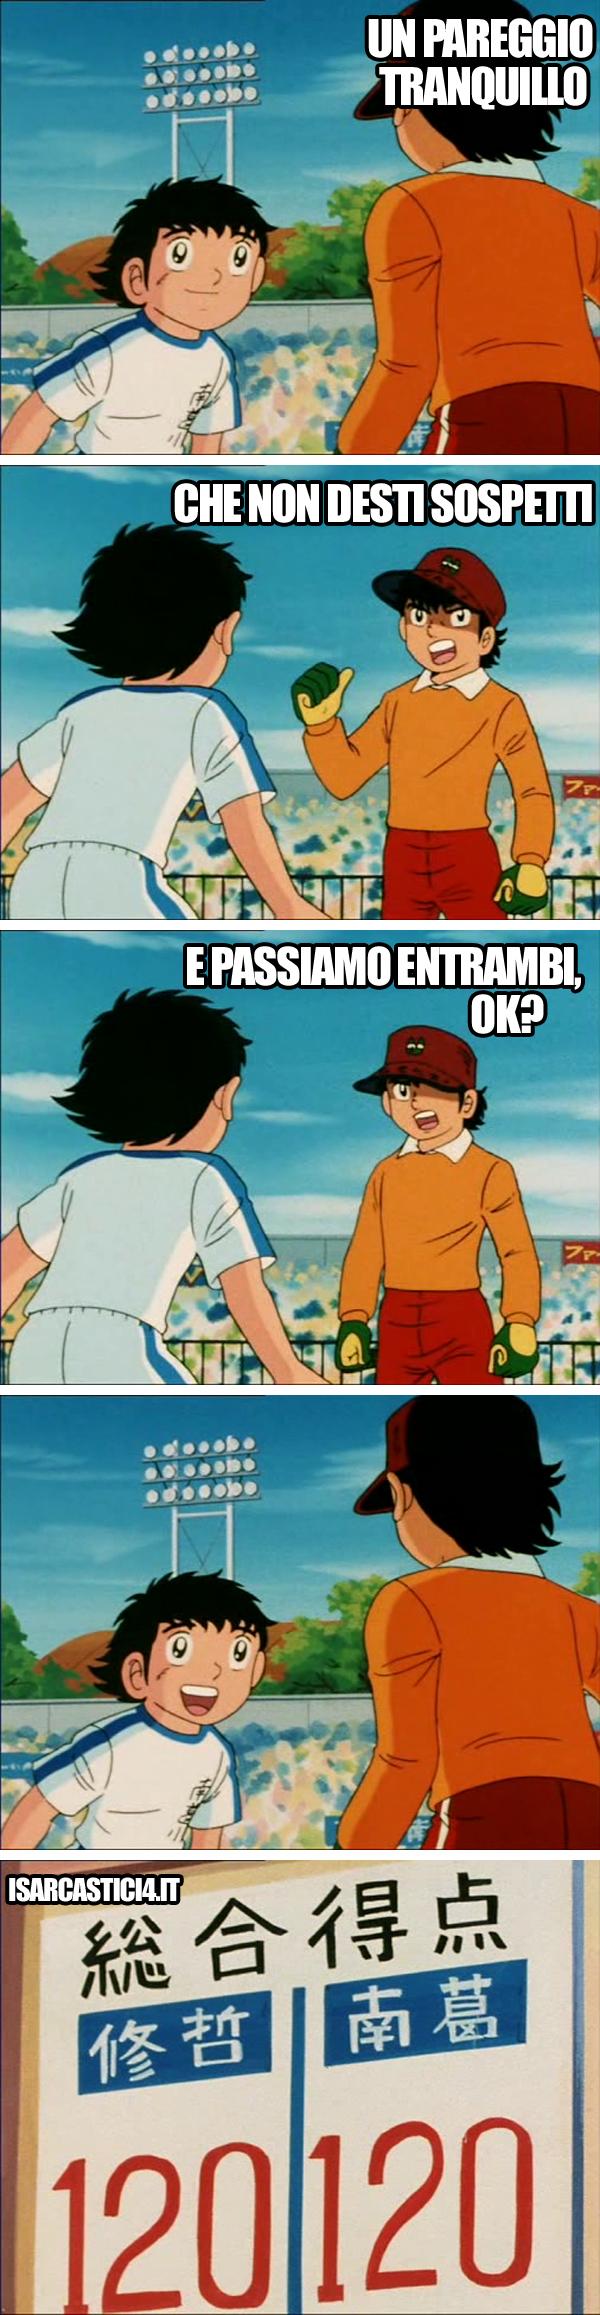 Holly e Benji - Capitan tsubasa meme ita - Calcioscommesse